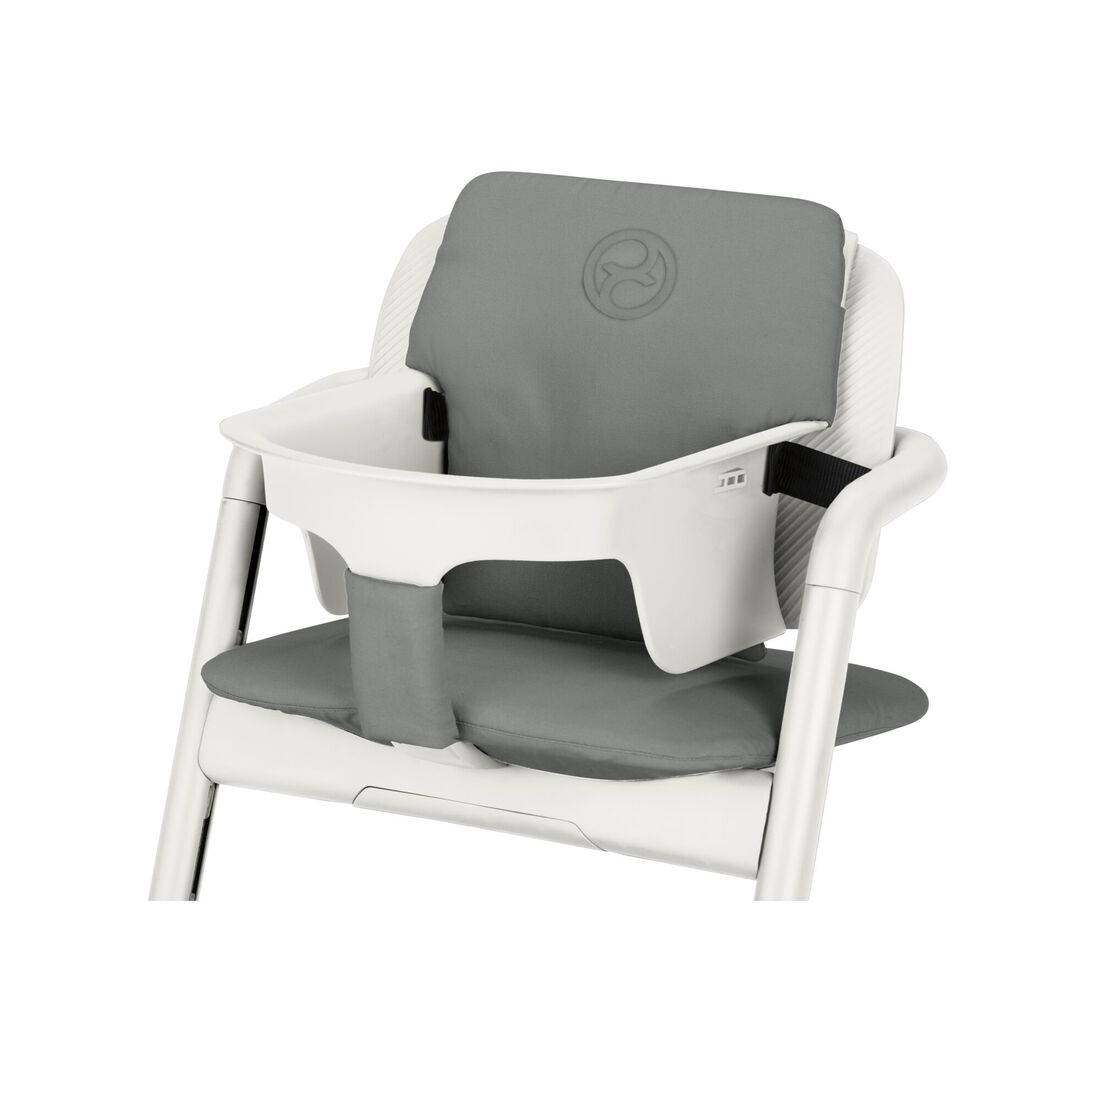 CYBEX Lemo Comfort Inlay - Storm Grey in Storm Grey large